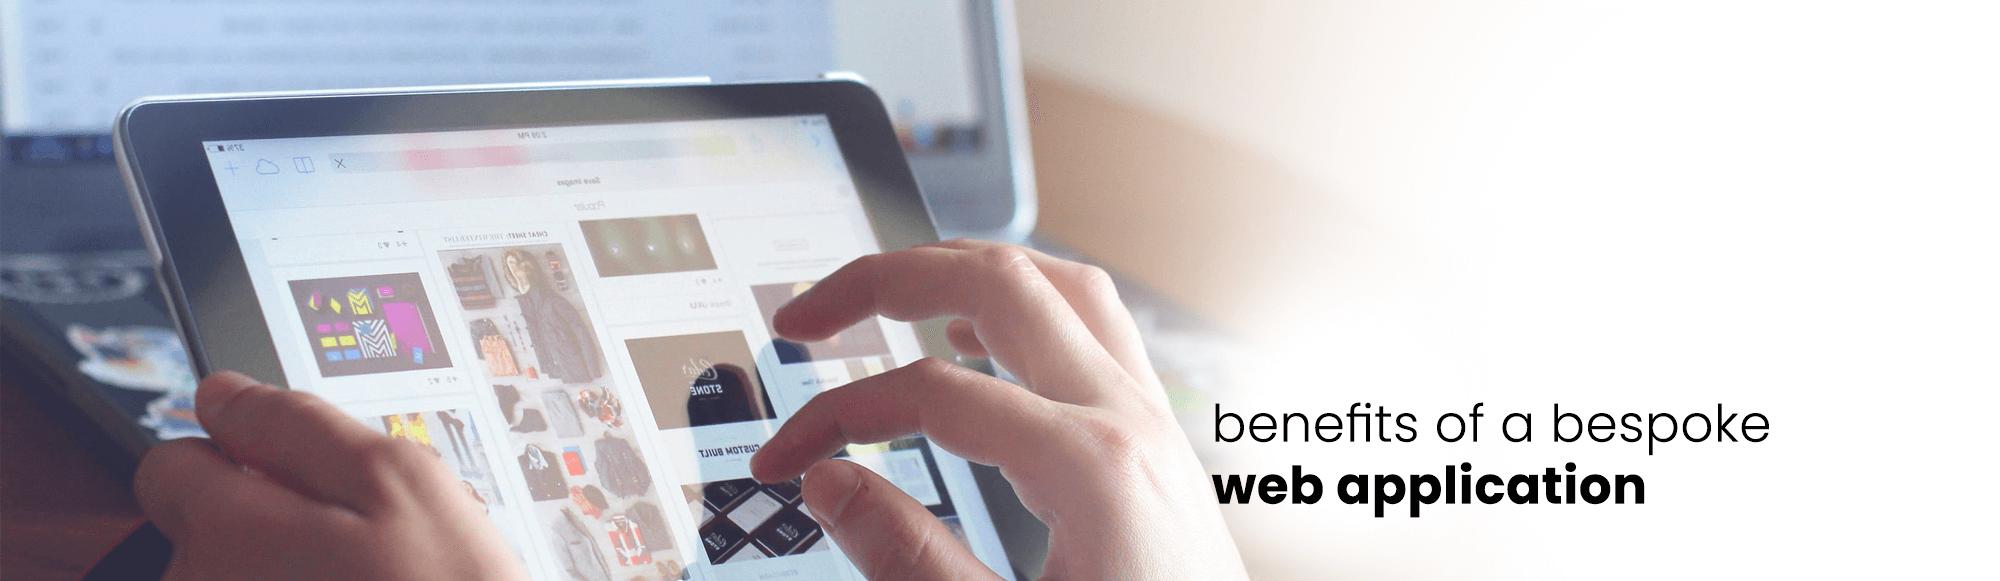 Advantages of a Bespoke Web Application